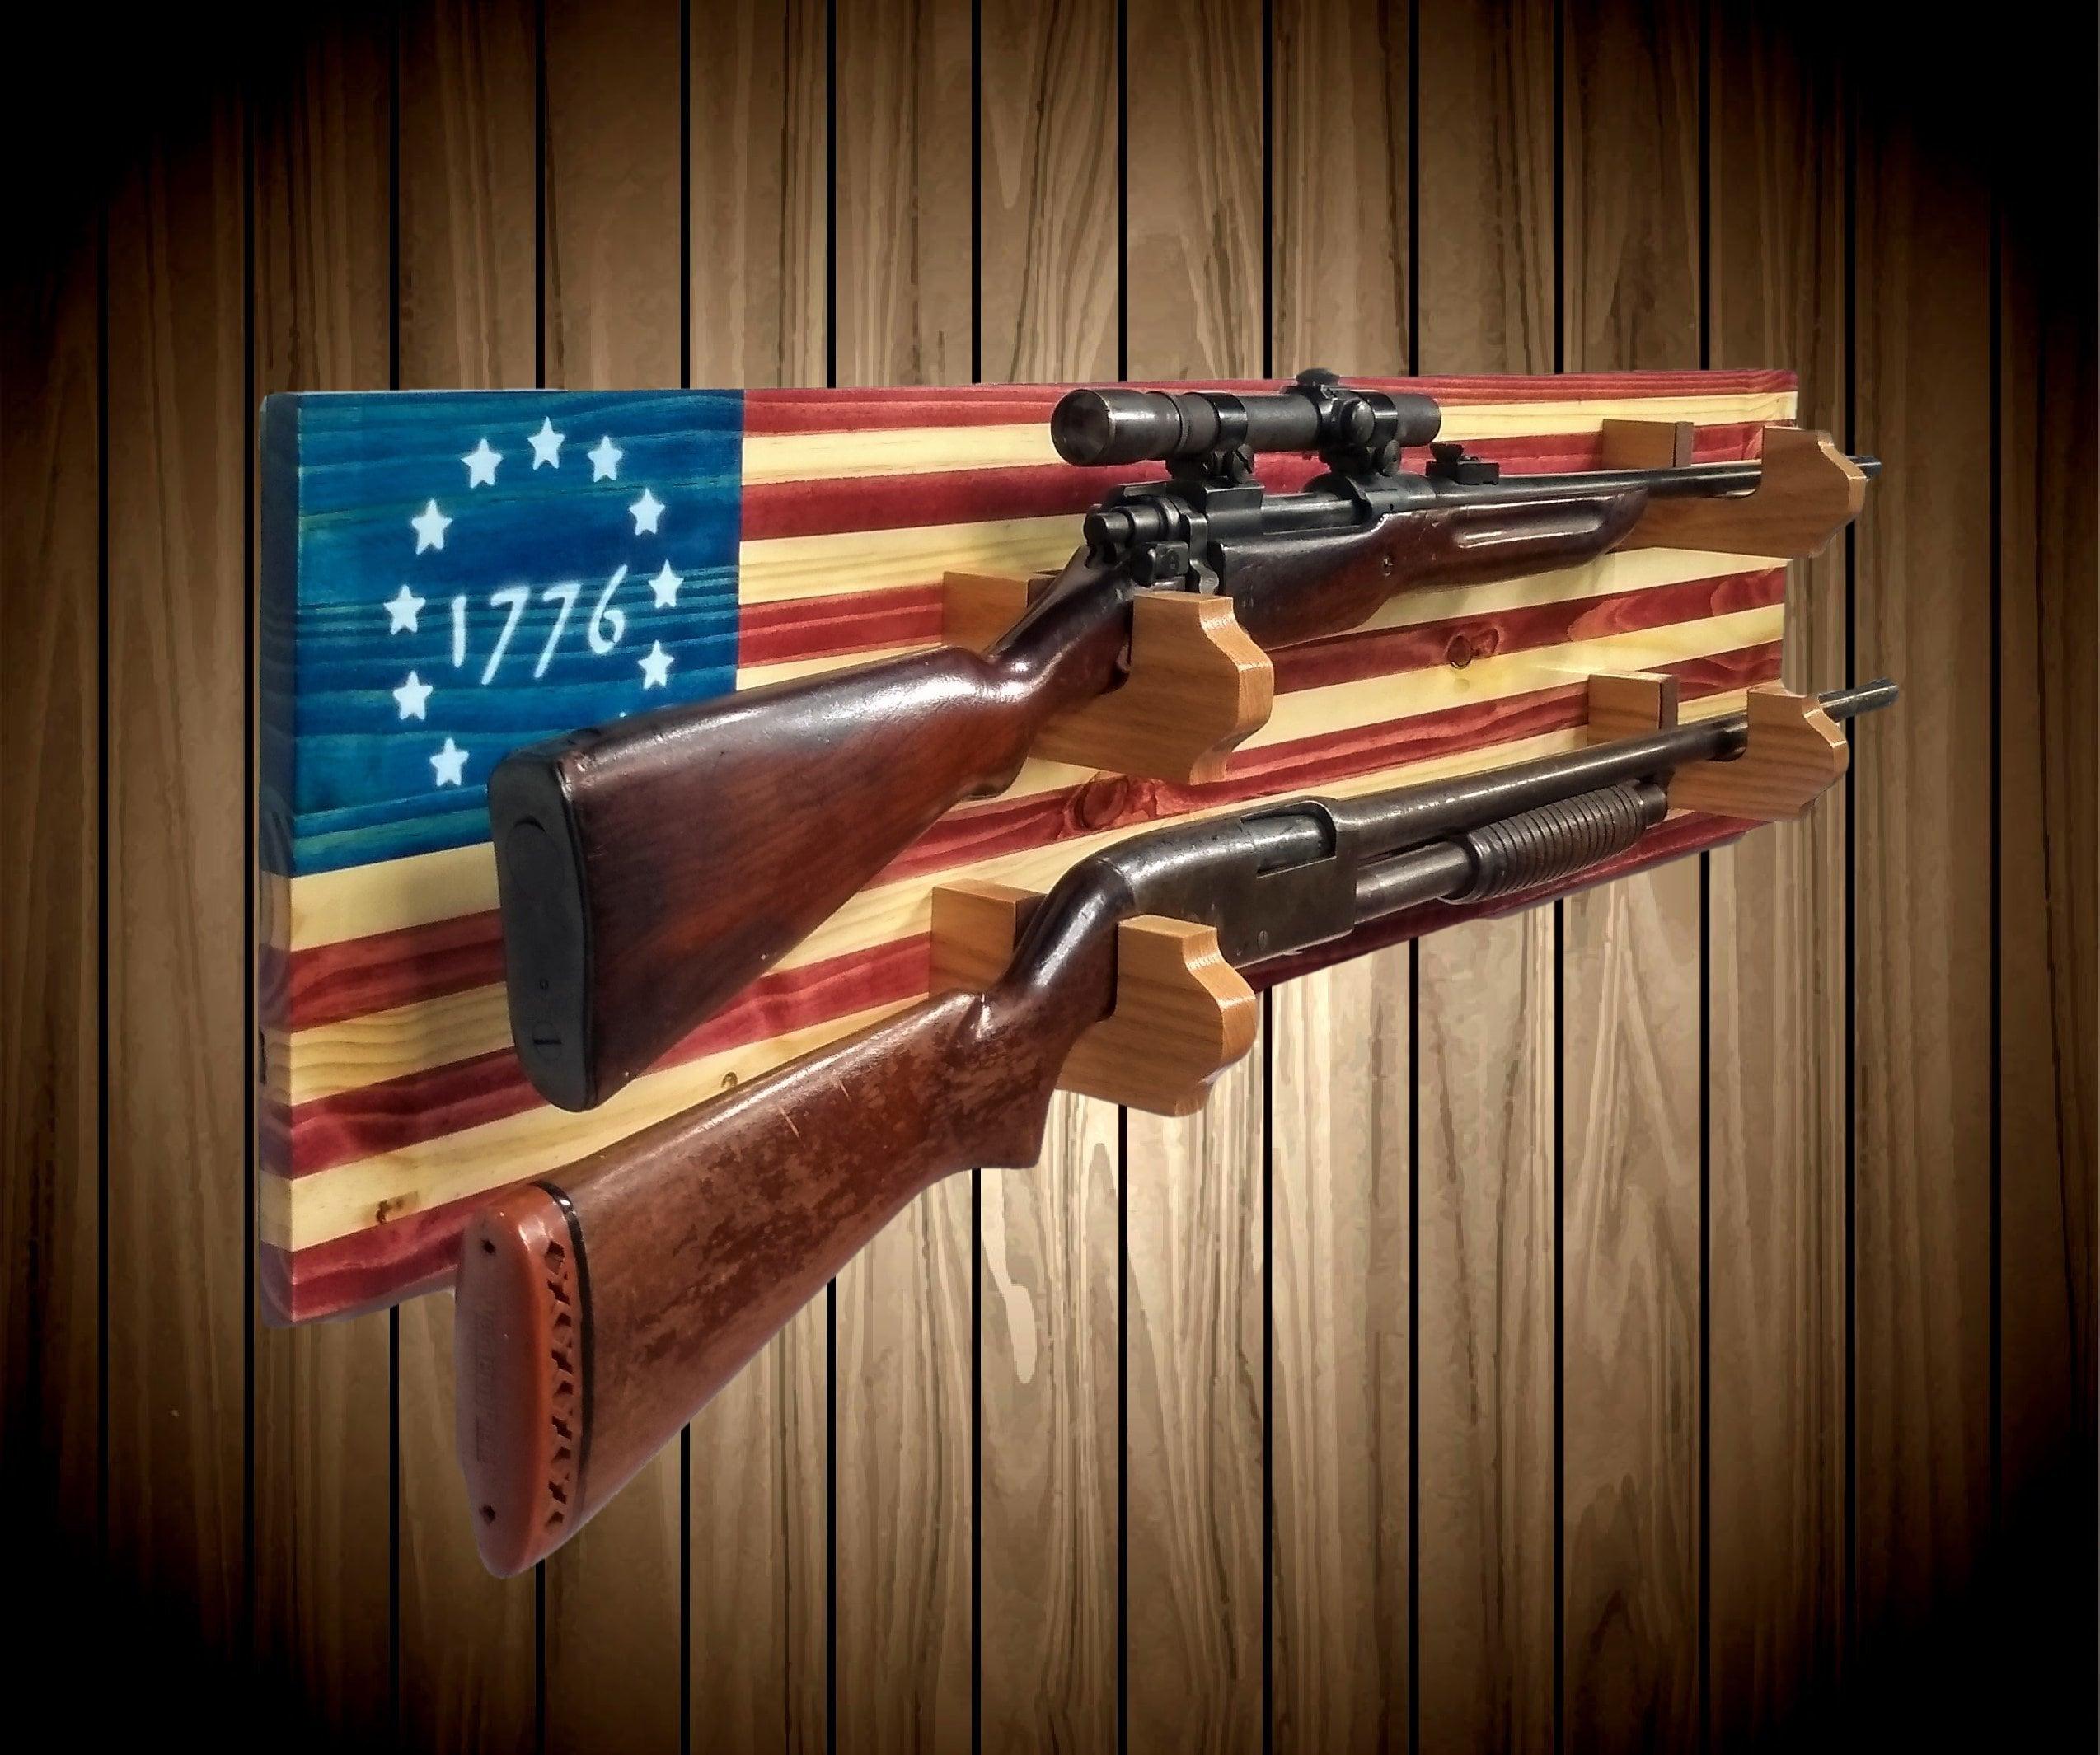 1776 american flag gun rack wall mount